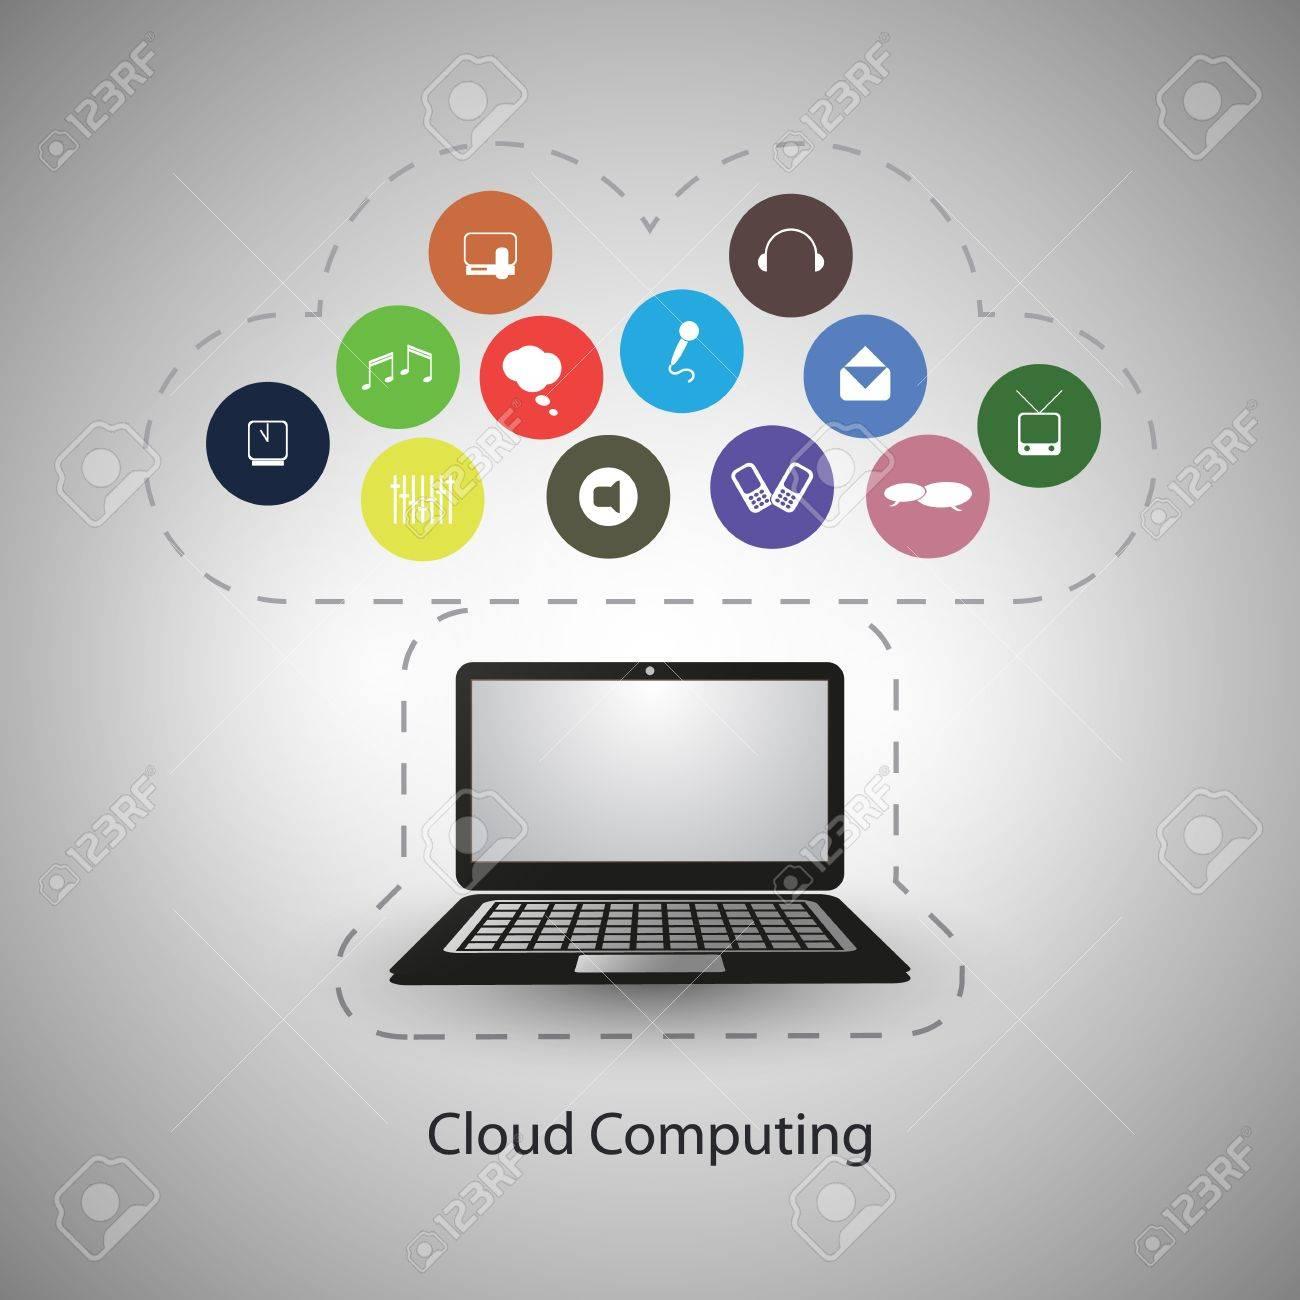 Cloud Computing Concept Stock Vector - 20881356